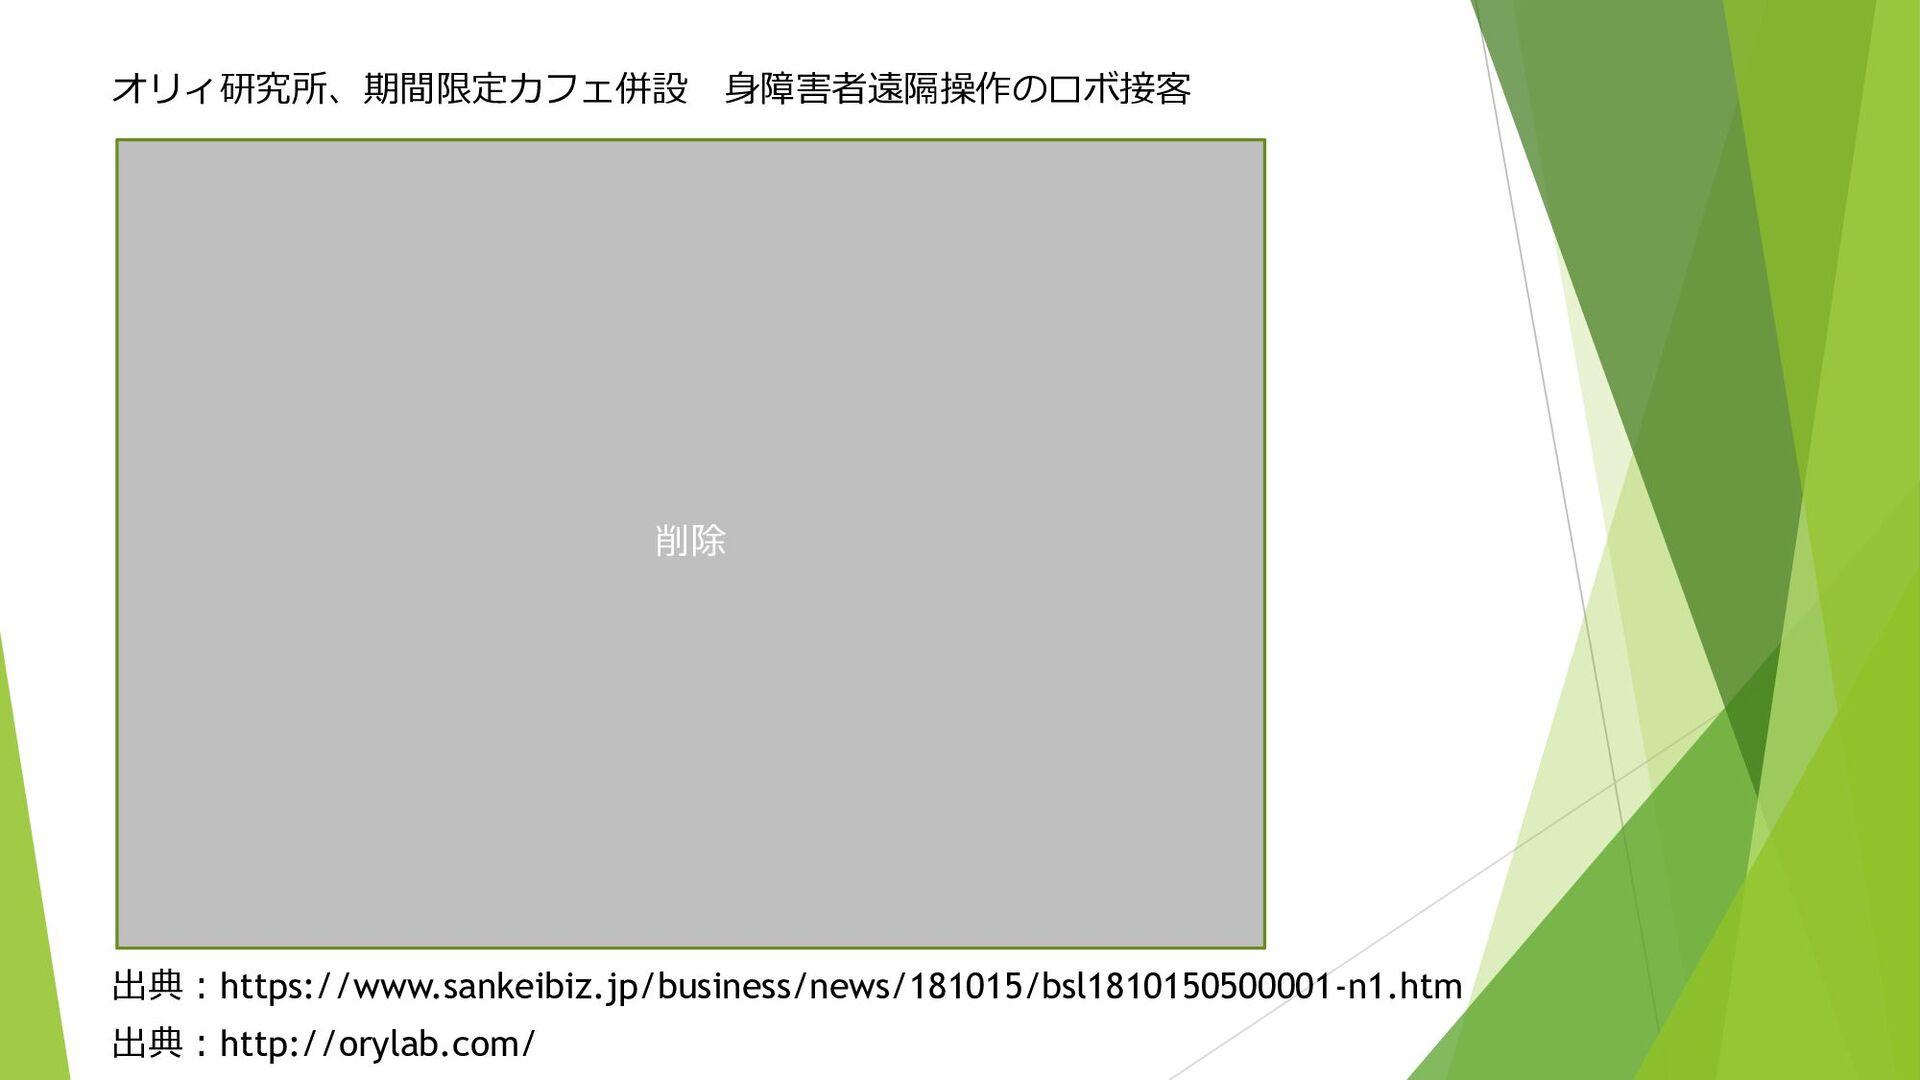 出典:https://www.sankeibiz.jp/business/news/18101...